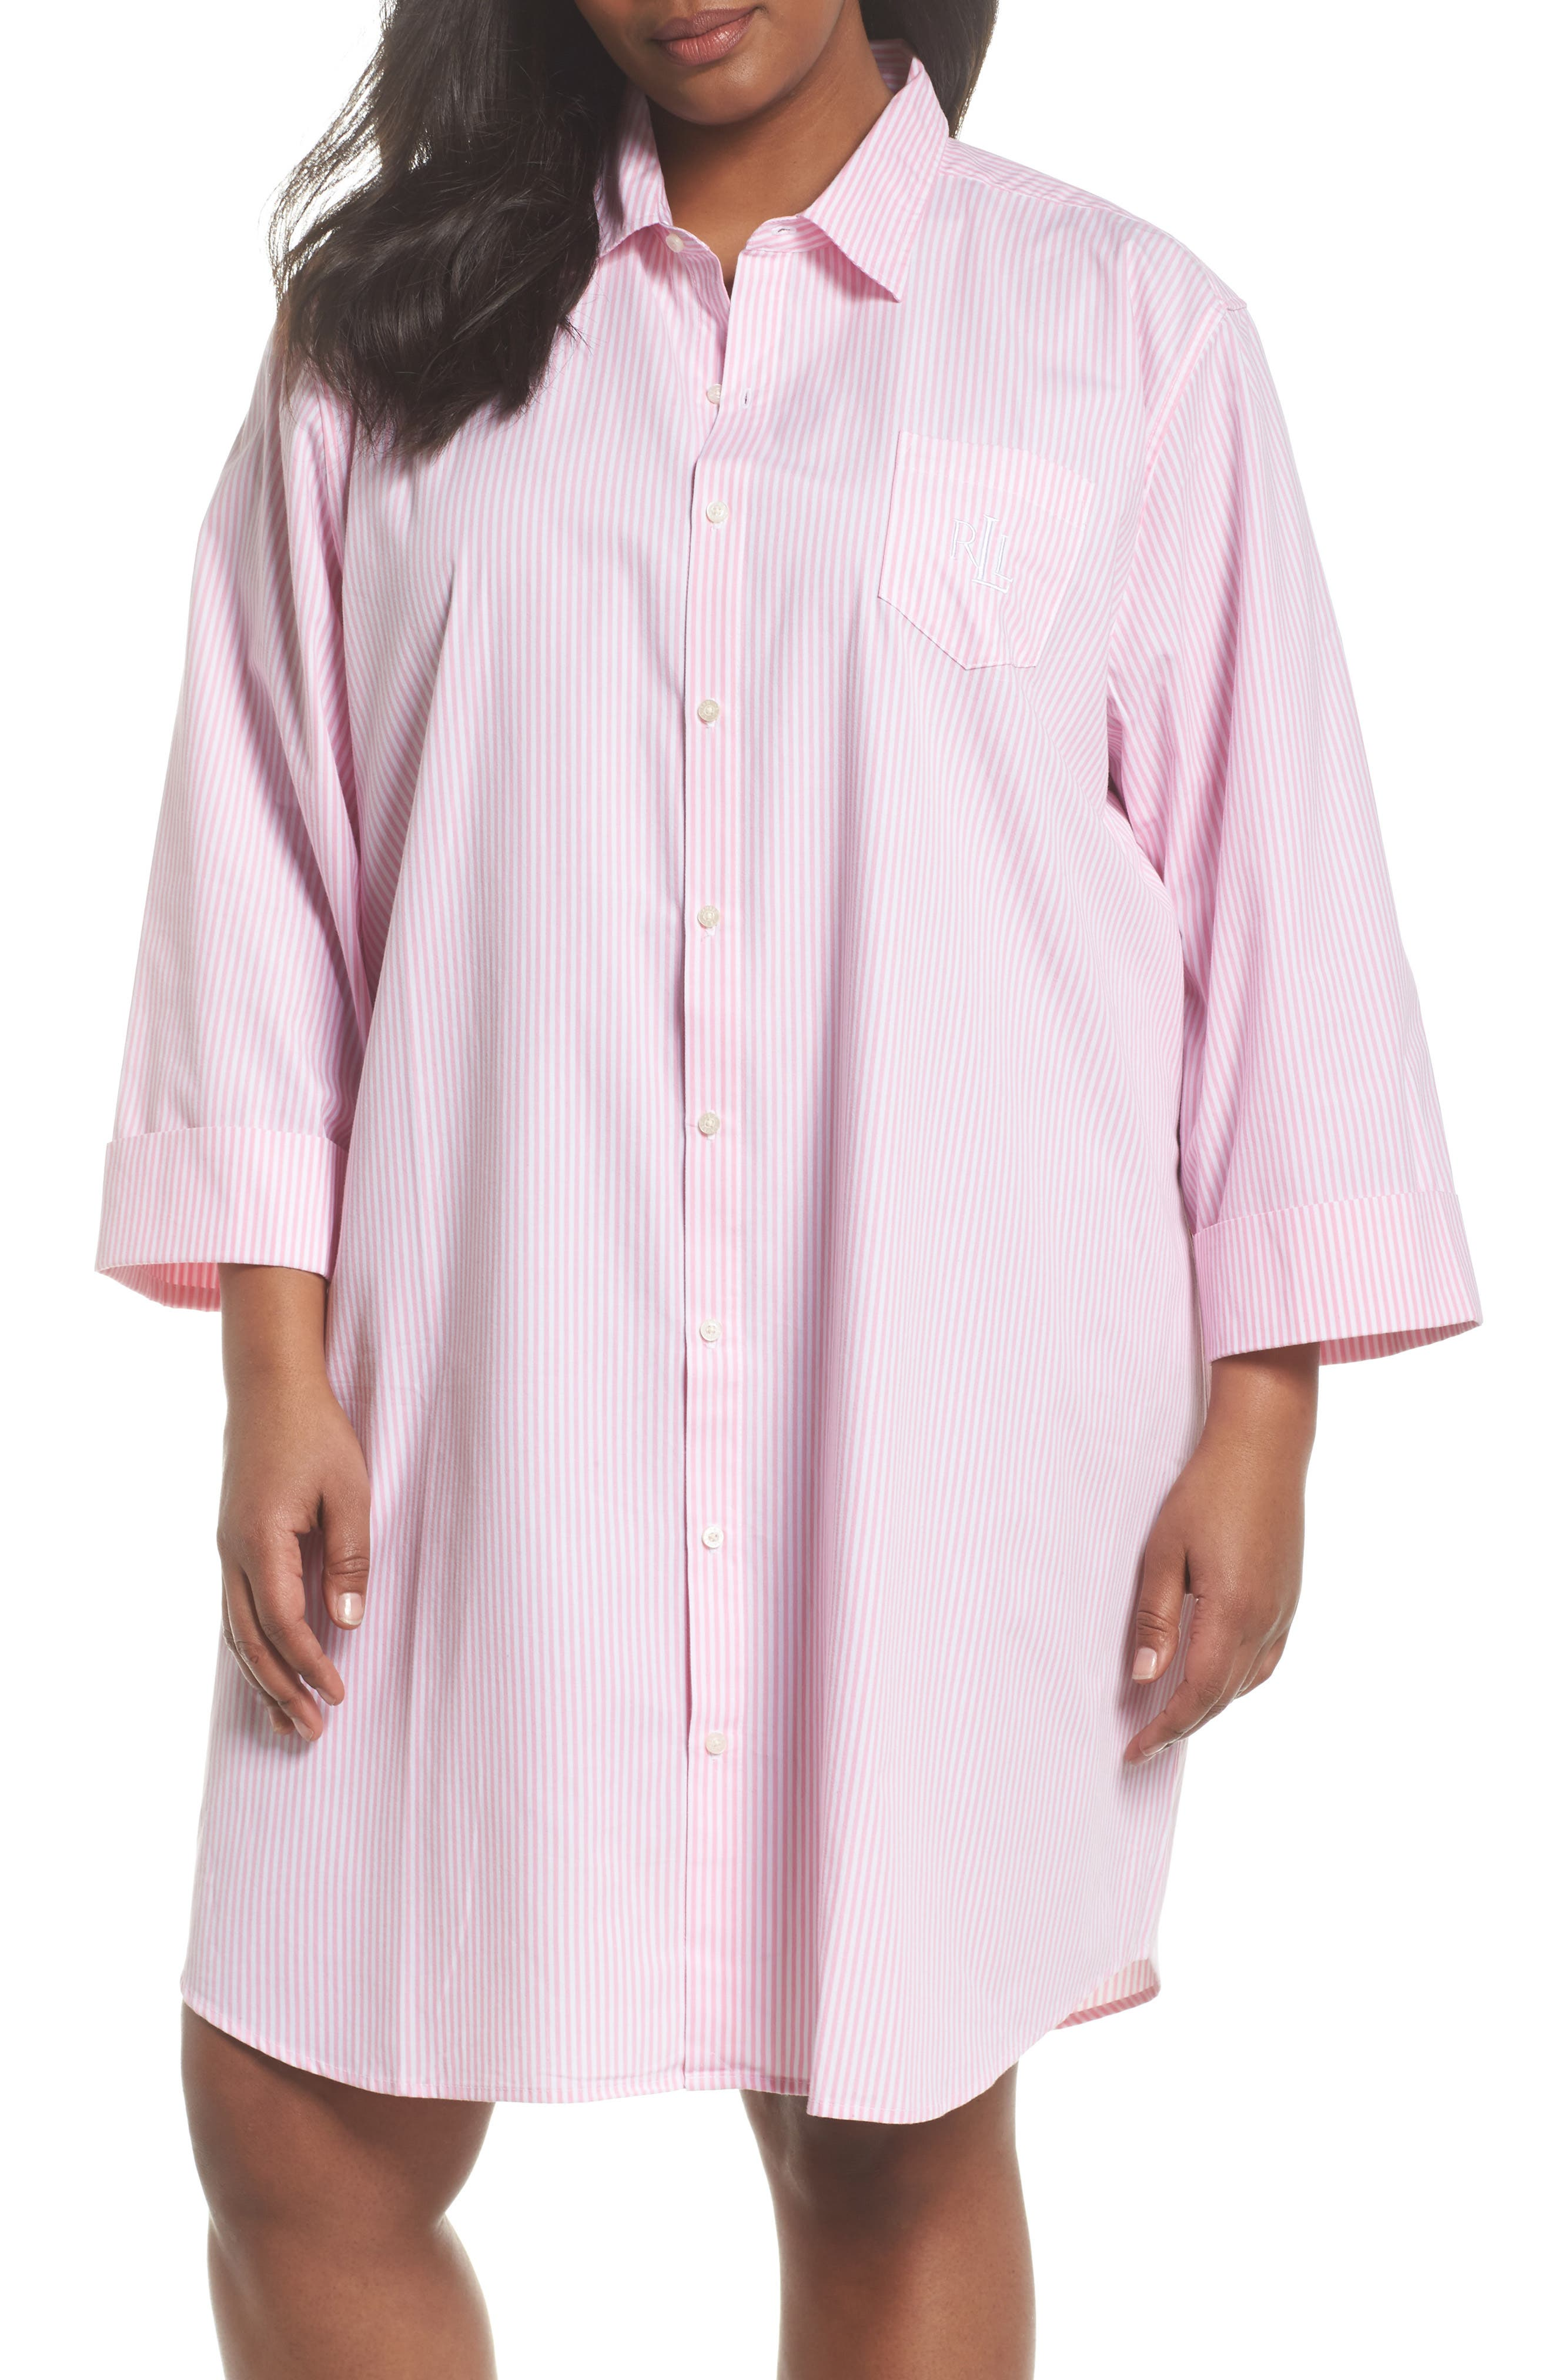 Sleep Shirt,                             Main thumbnail 1, color,                             667